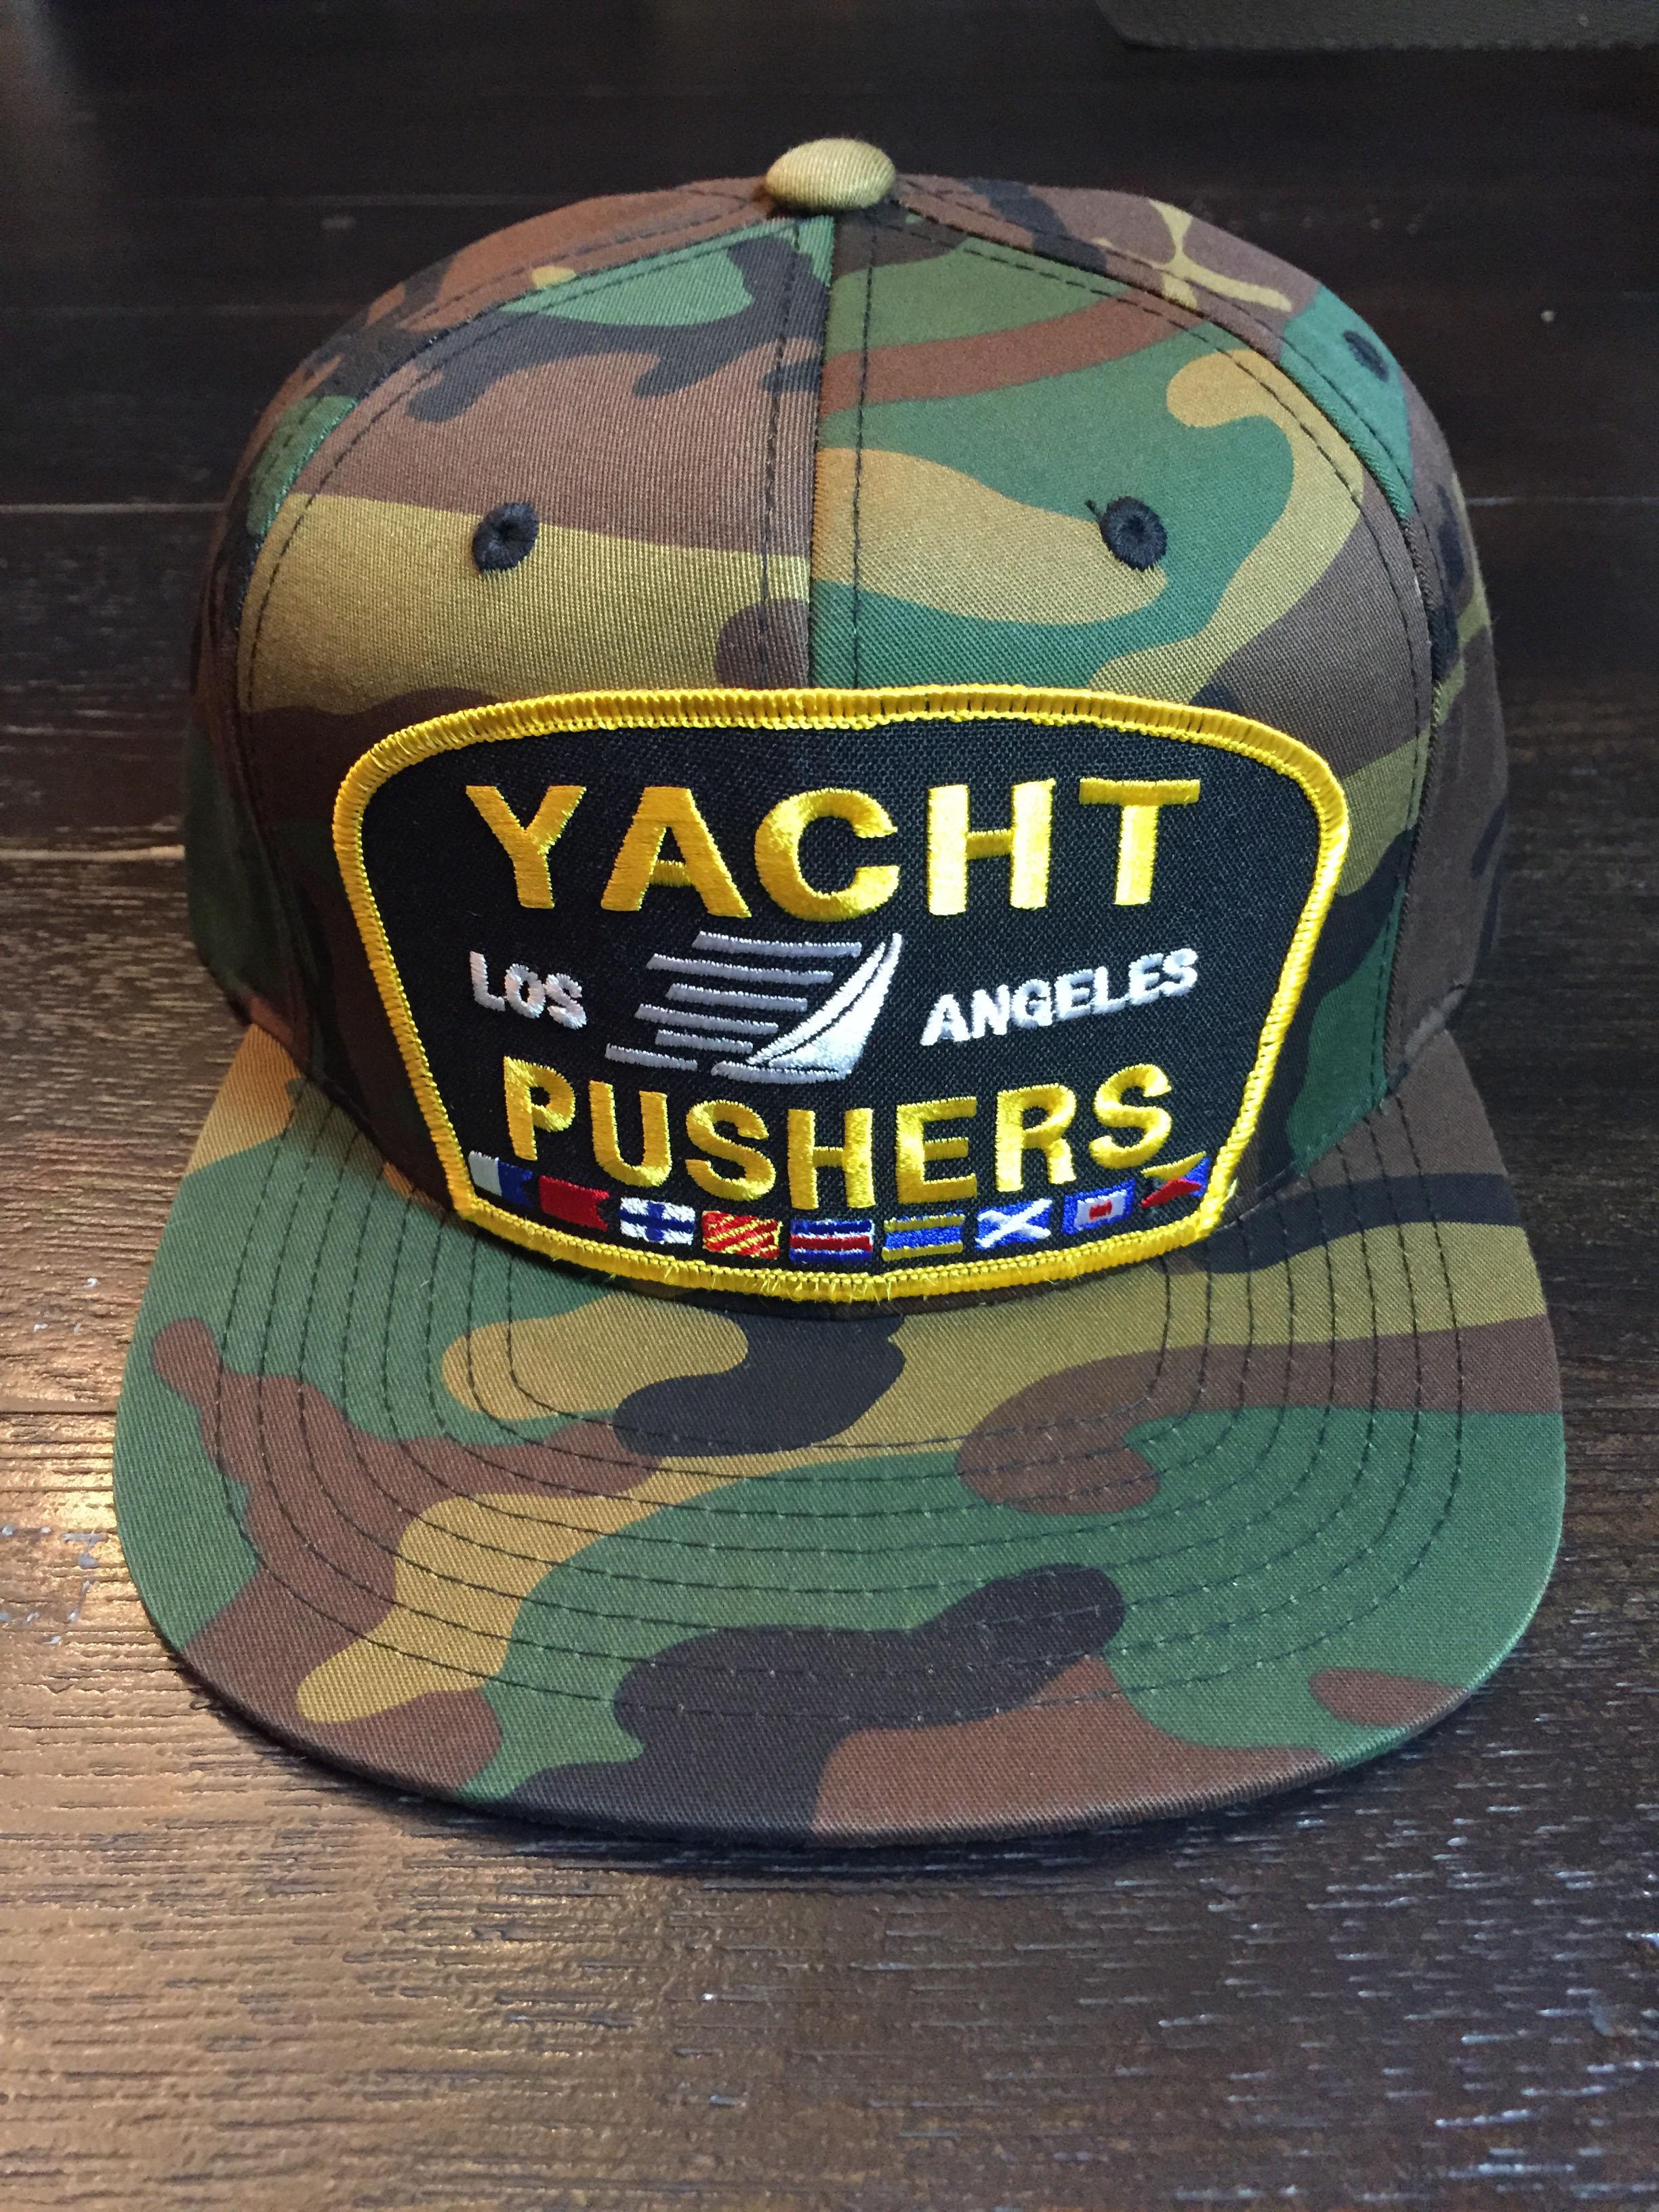 Yacht Pushers